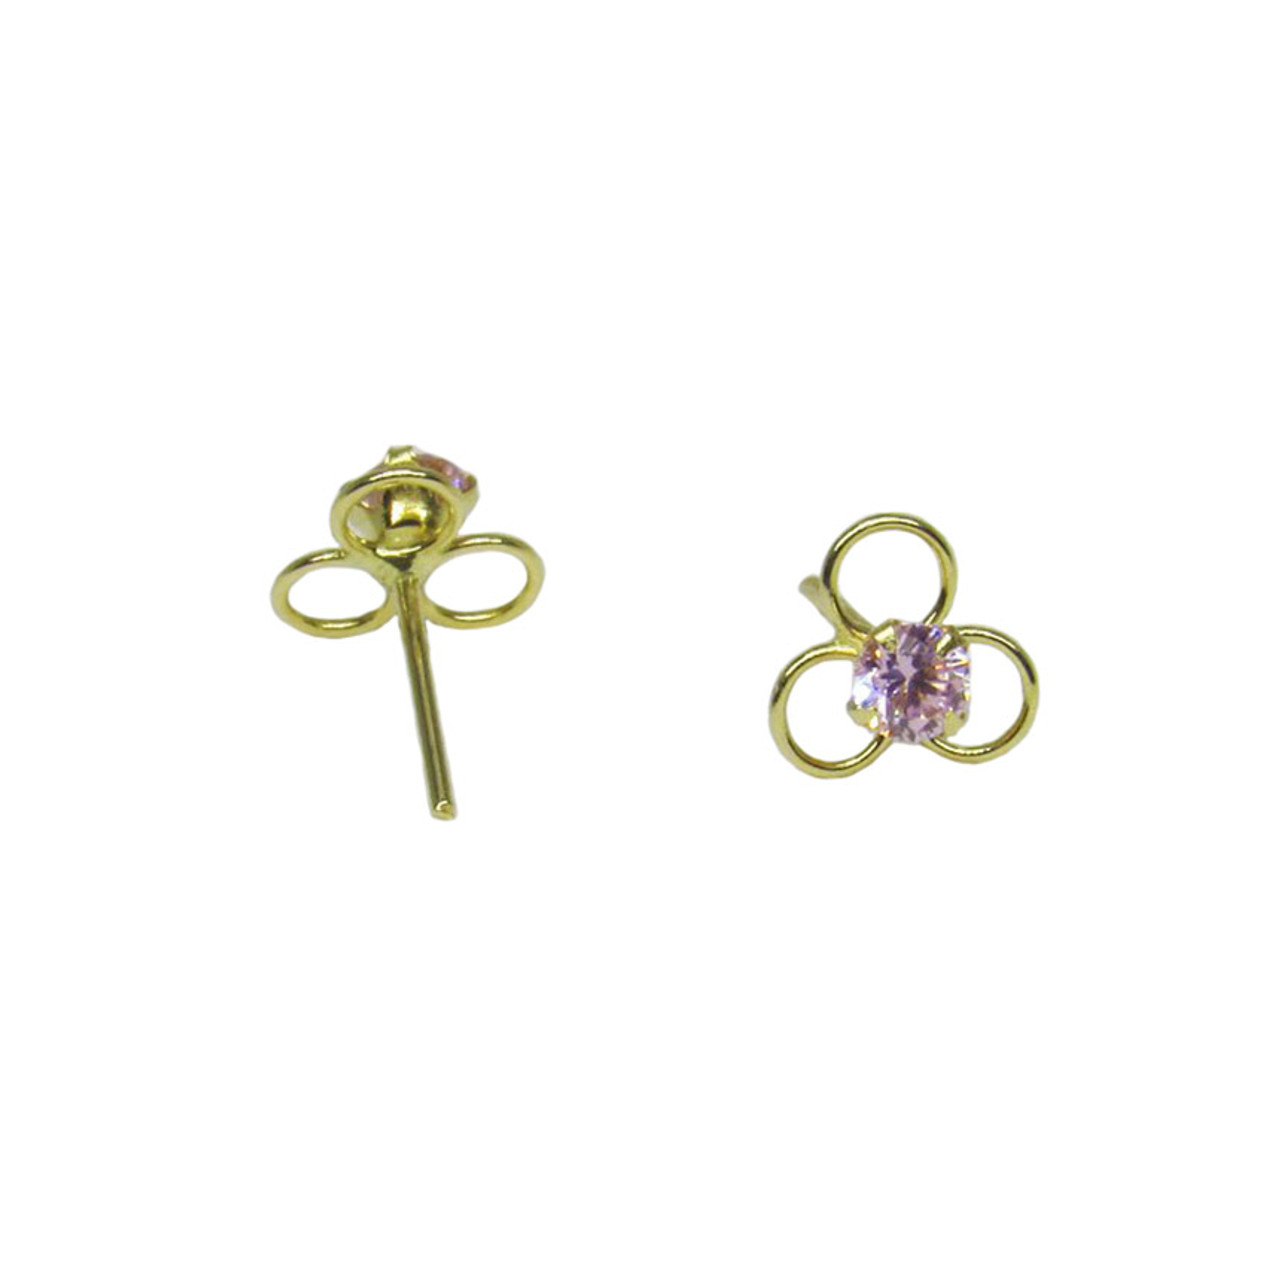 Brinco de ouro 18k Infantil Flor Zircônia Rosa 5,60mm (CJBR-00000331) fe5bfffa95